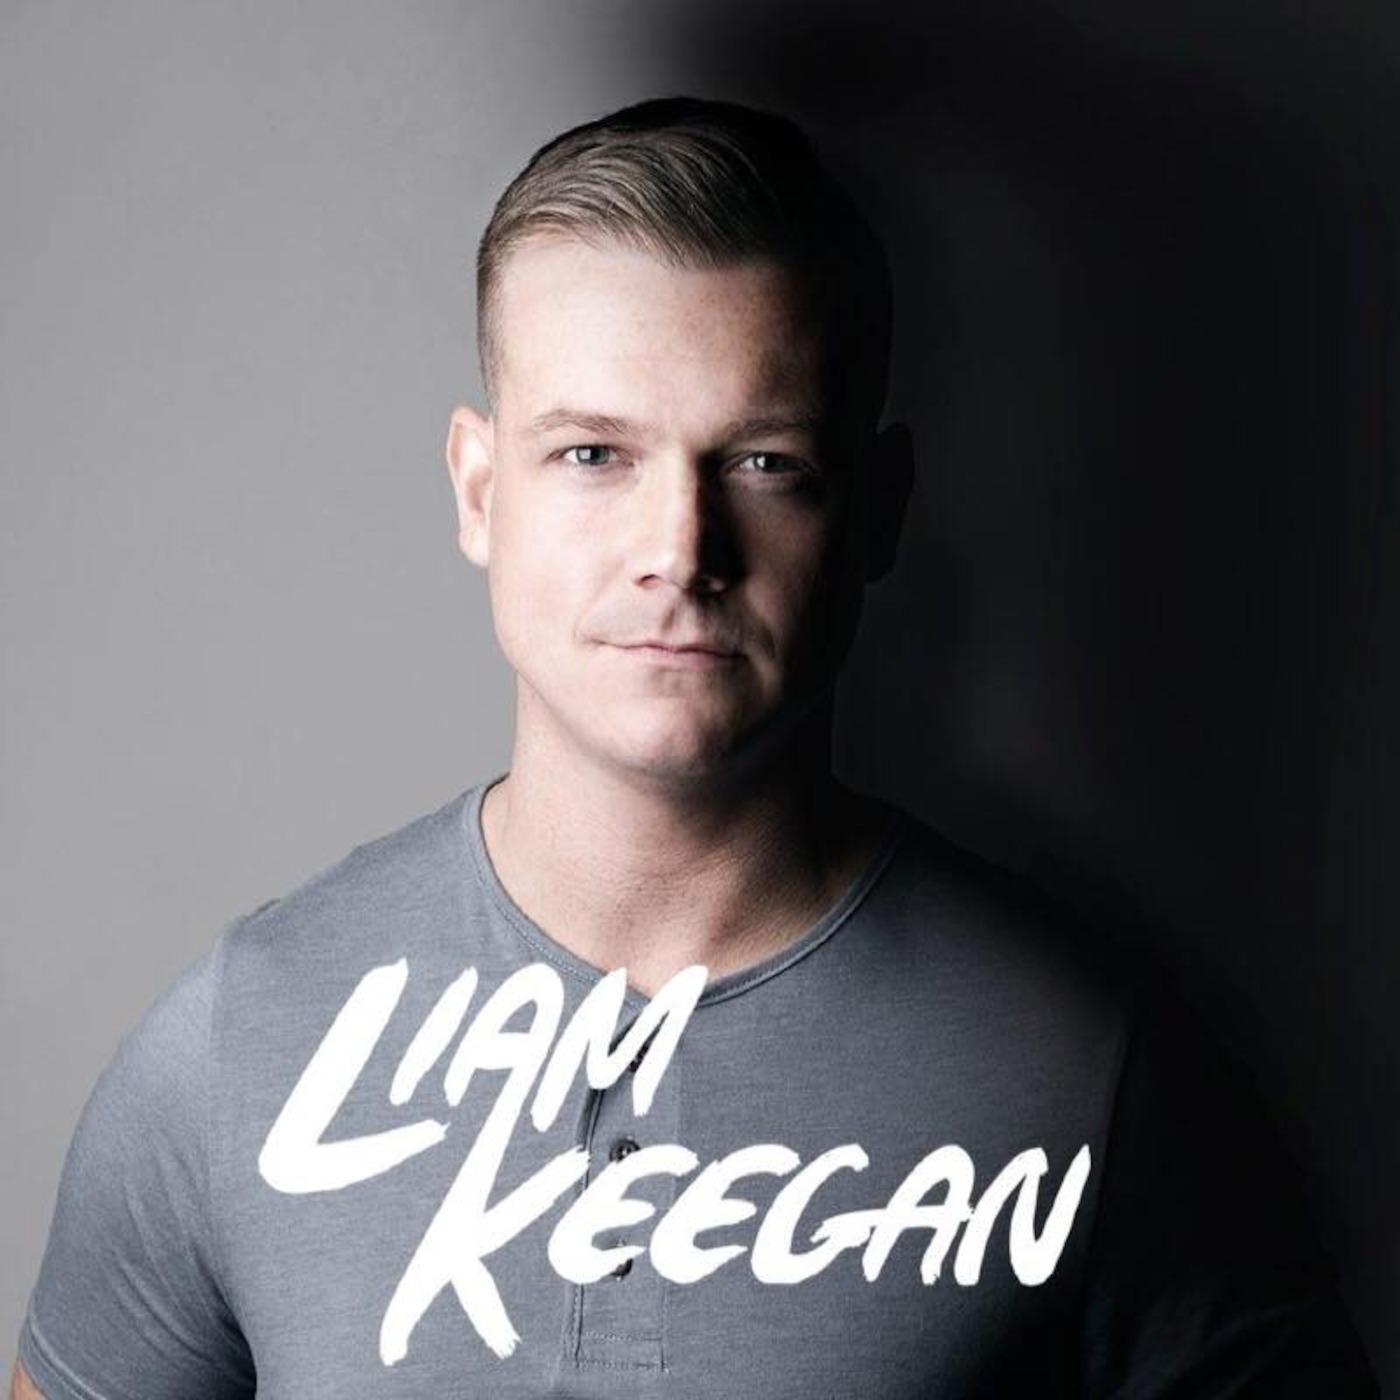 Liam Keegan Breakin' The Rules September 2018 Mix